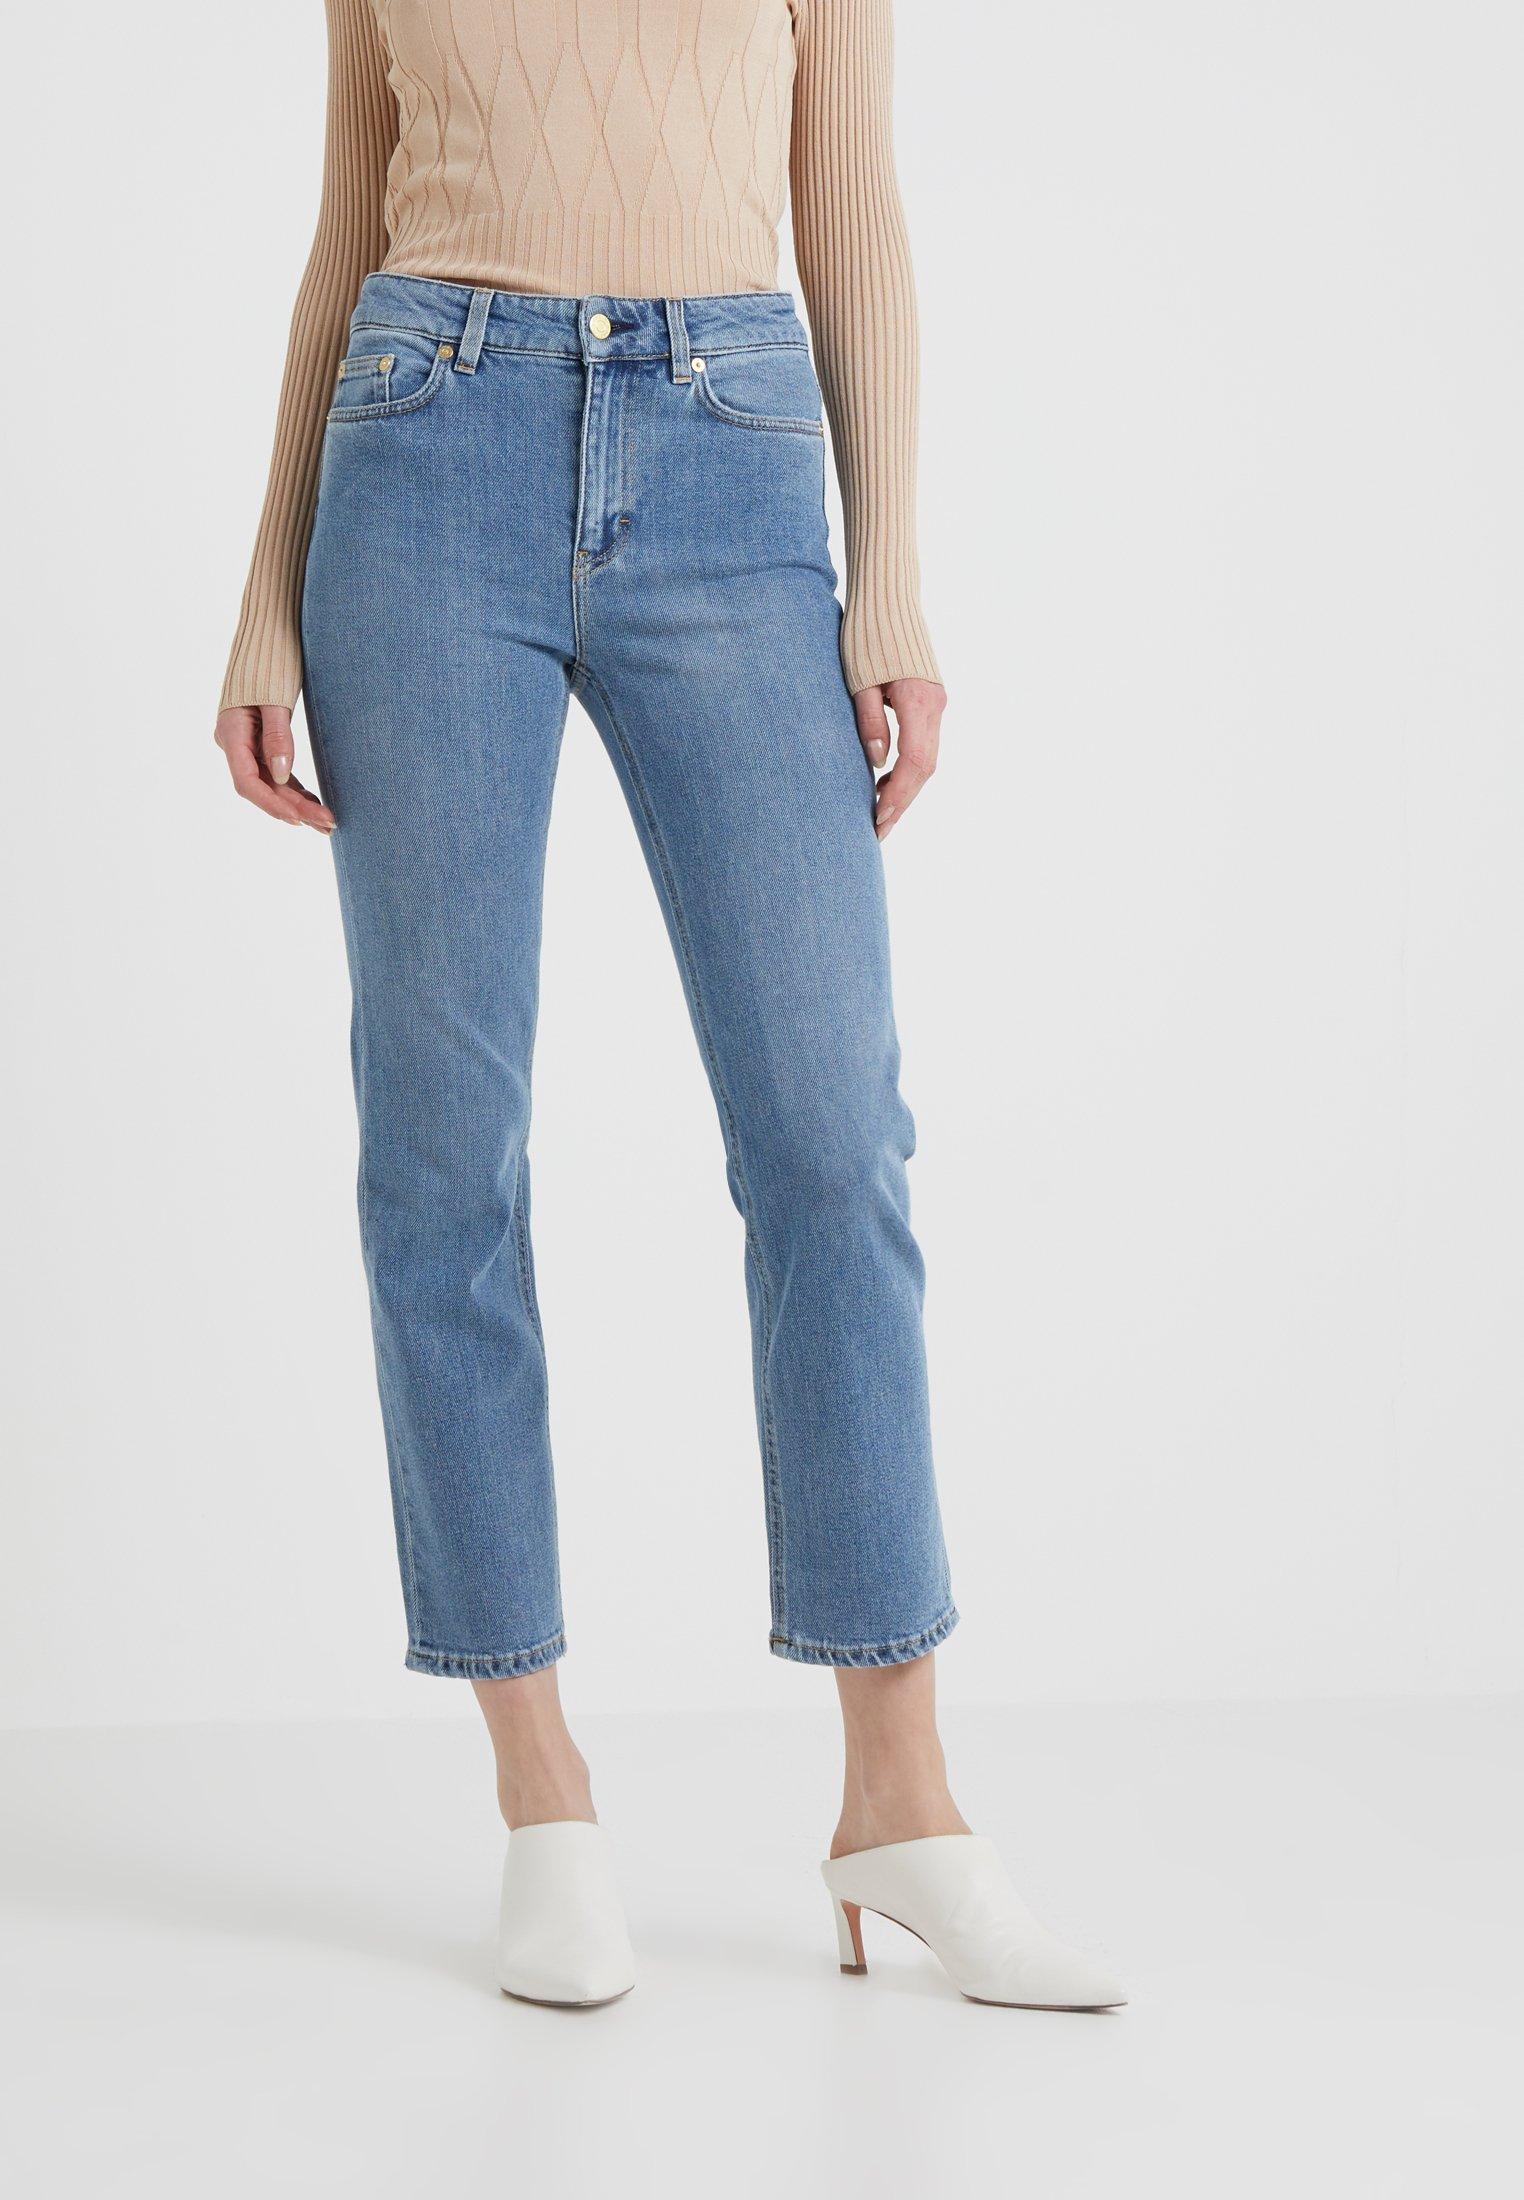 Filippa K Jeans | Dame | Nye jeans online på Zalando Norge